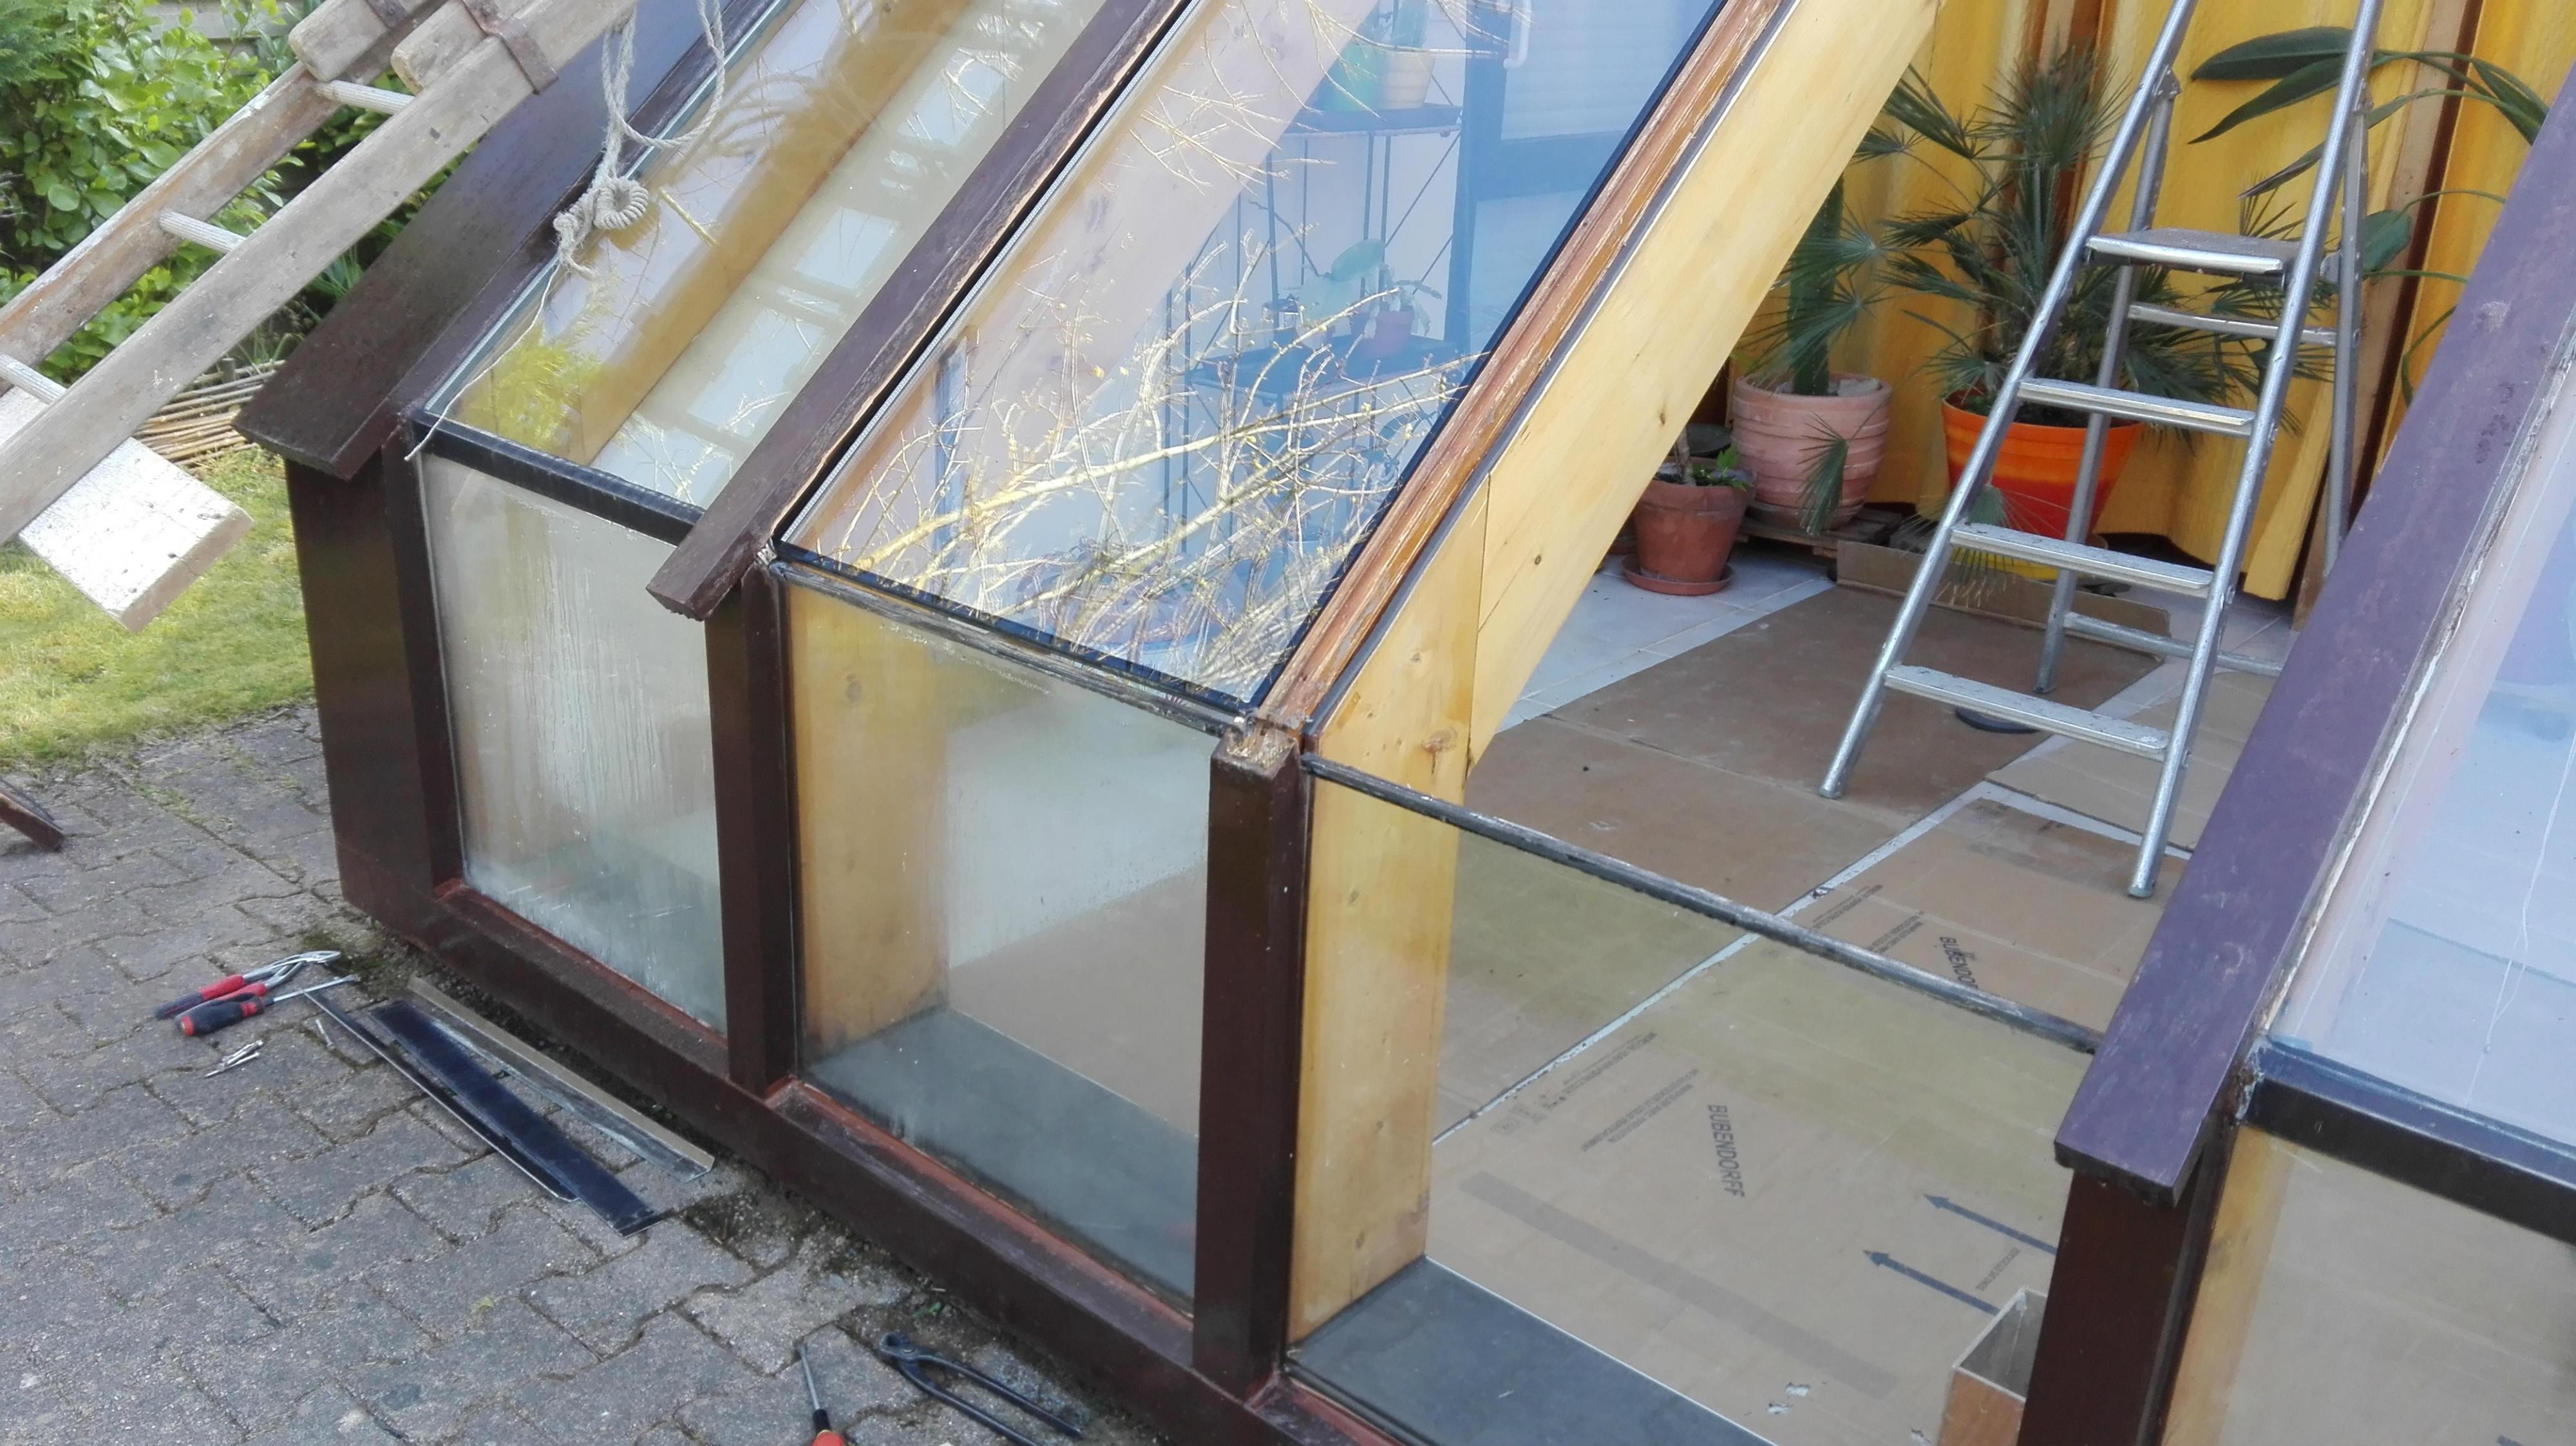 remplacement double vitrage dans une v randa brest mvm. Black Bedroom Furniture Sets. Home Design Ideas